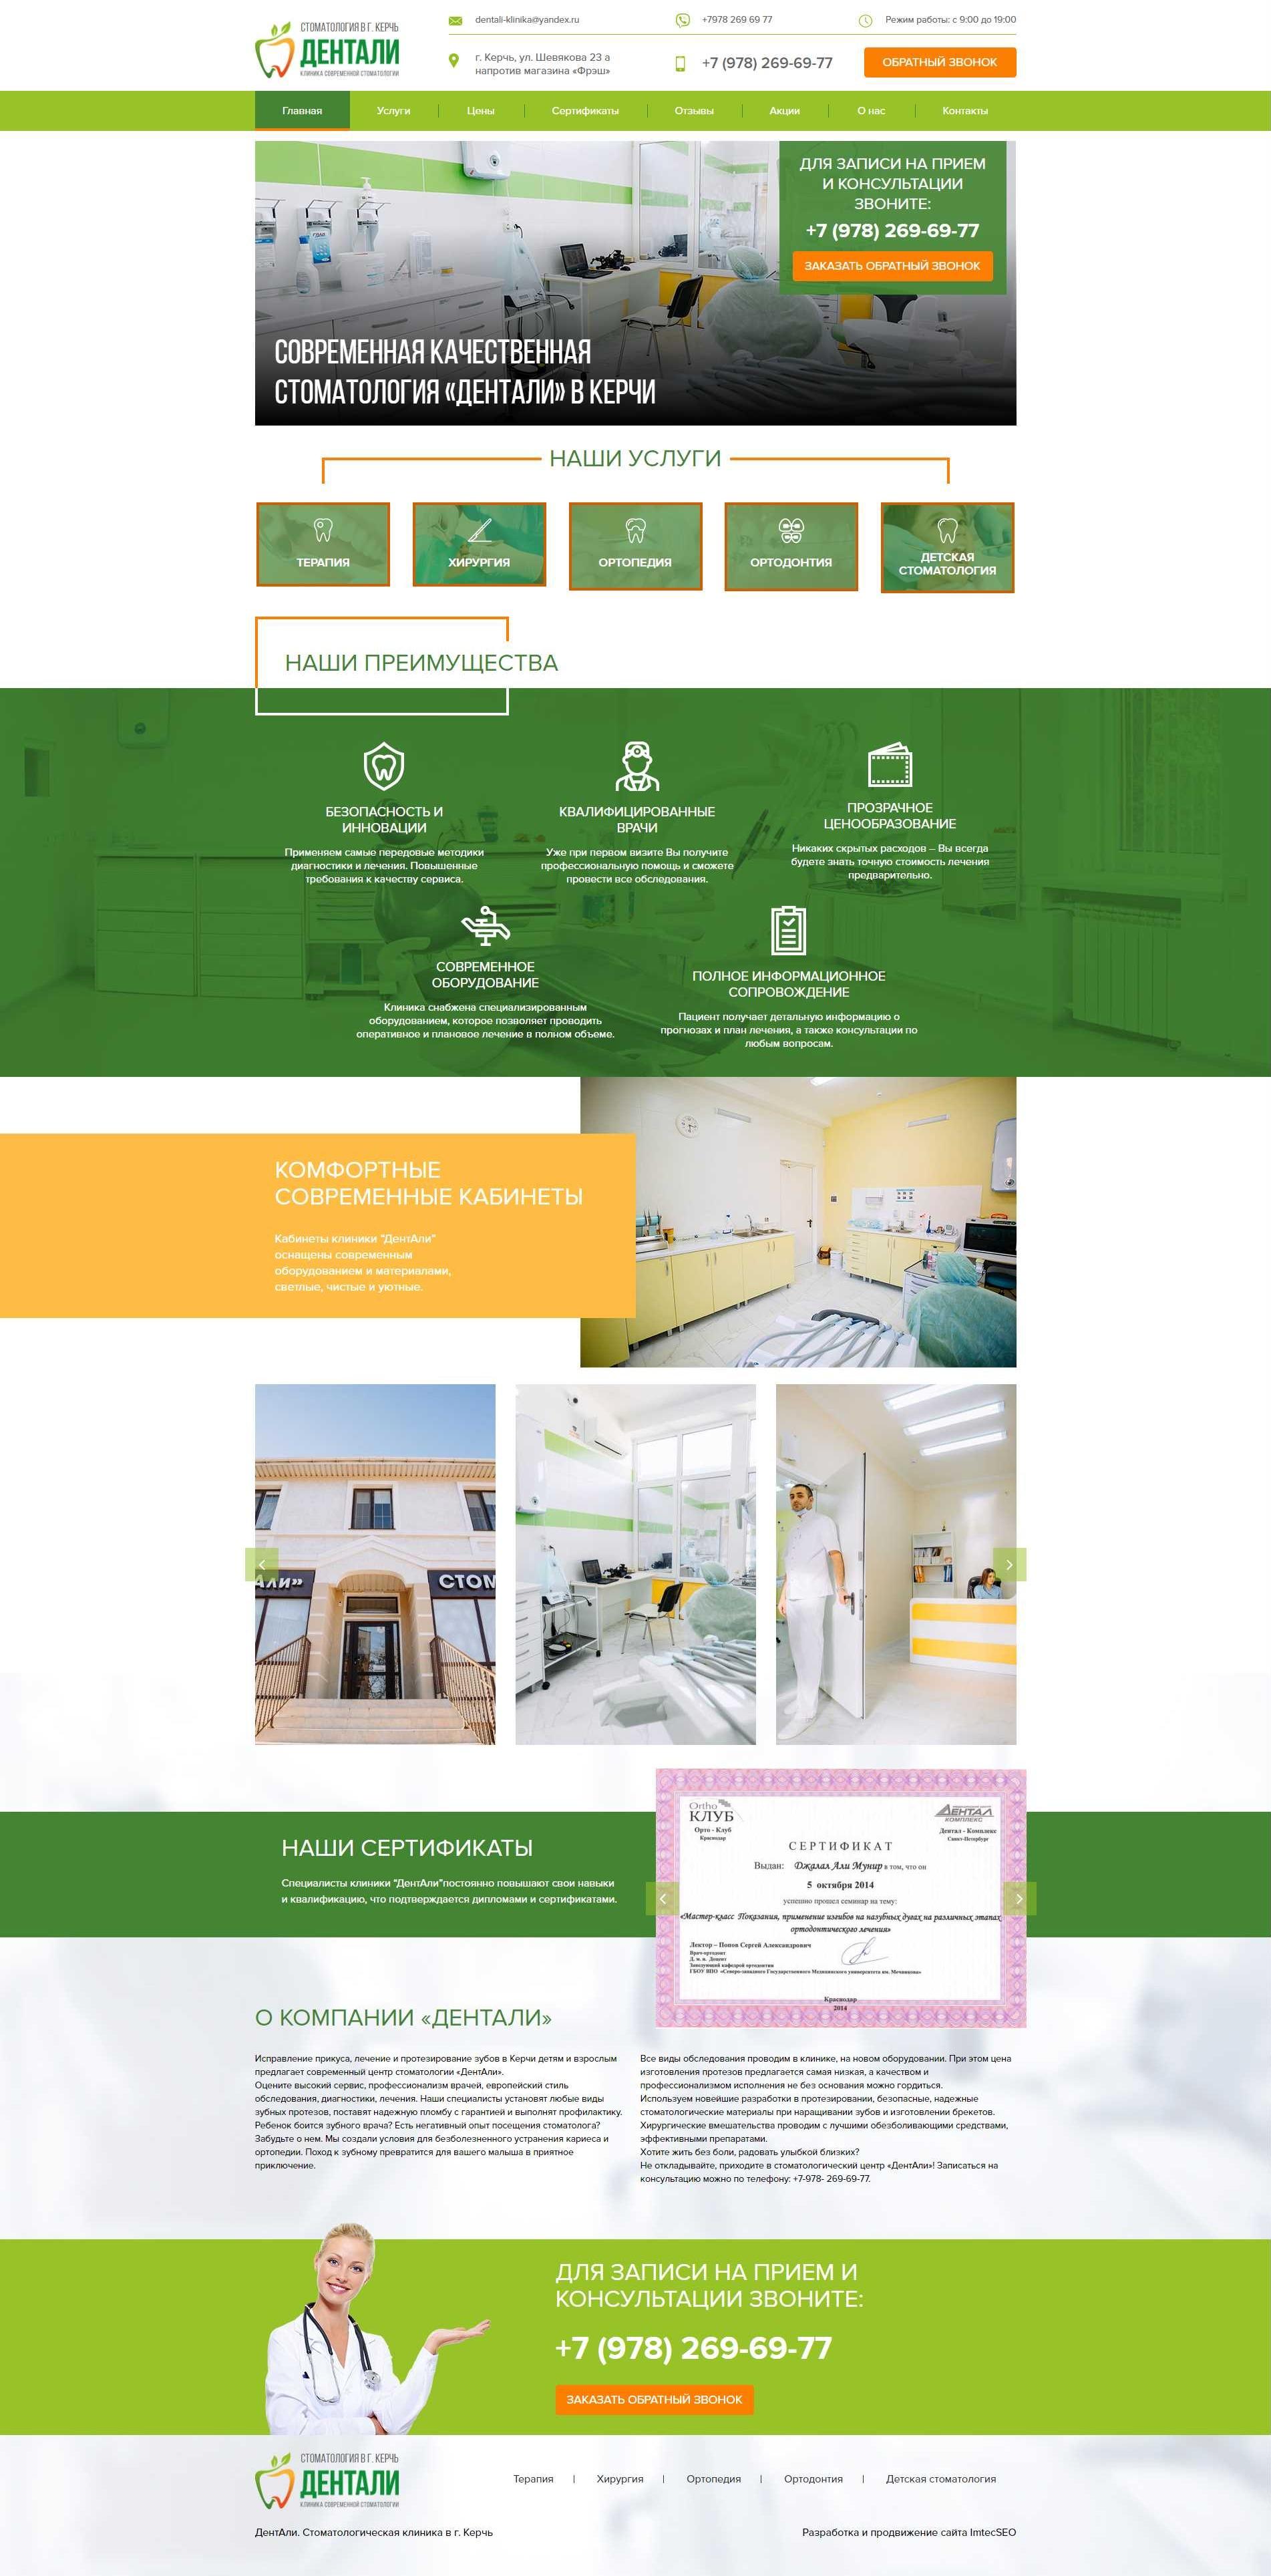 screenshot-dentali-klinika-ruhttps-dentali-klinika-ru-5